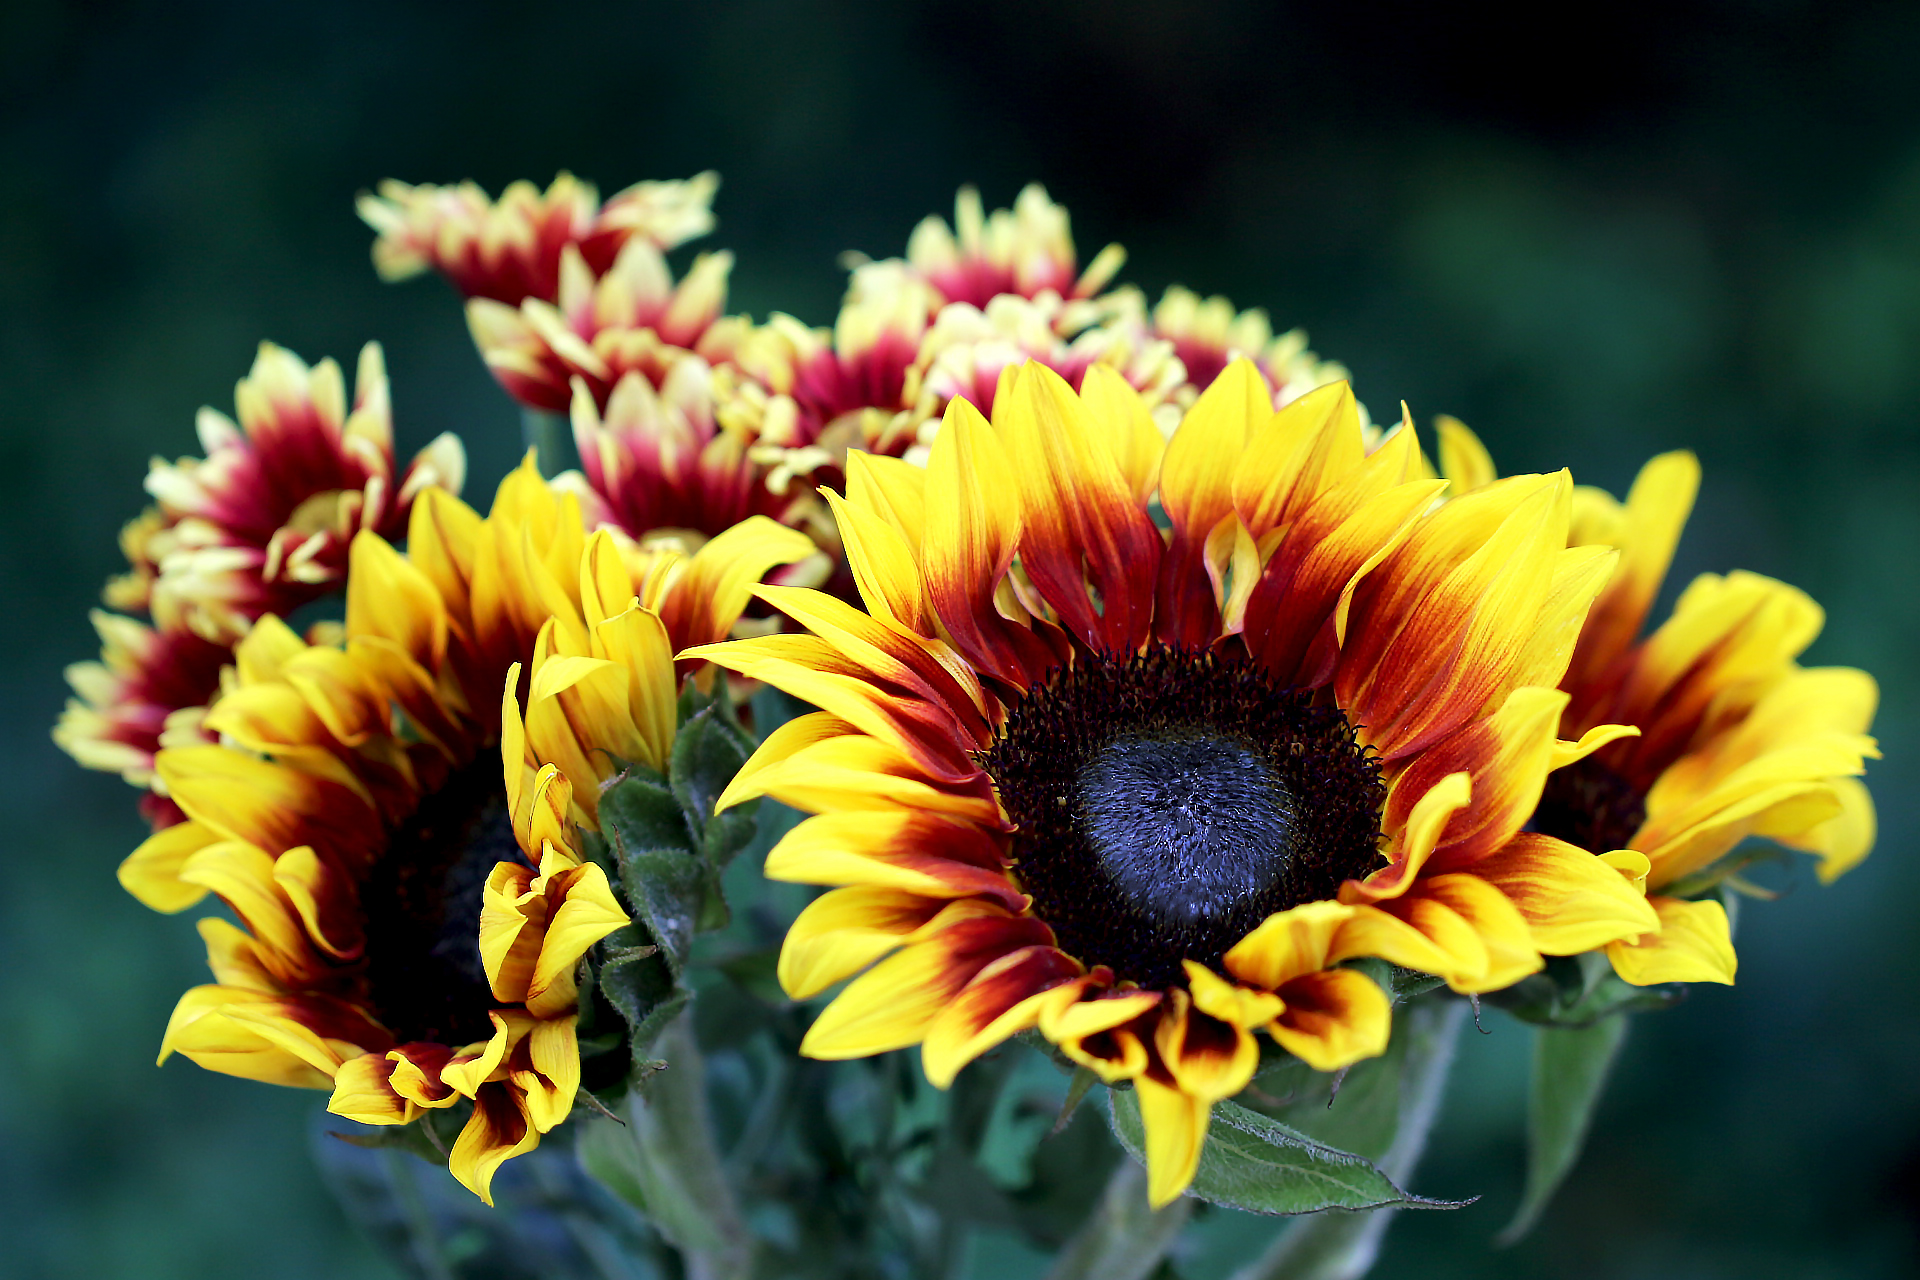 sunflowers-and-chrysanthemums